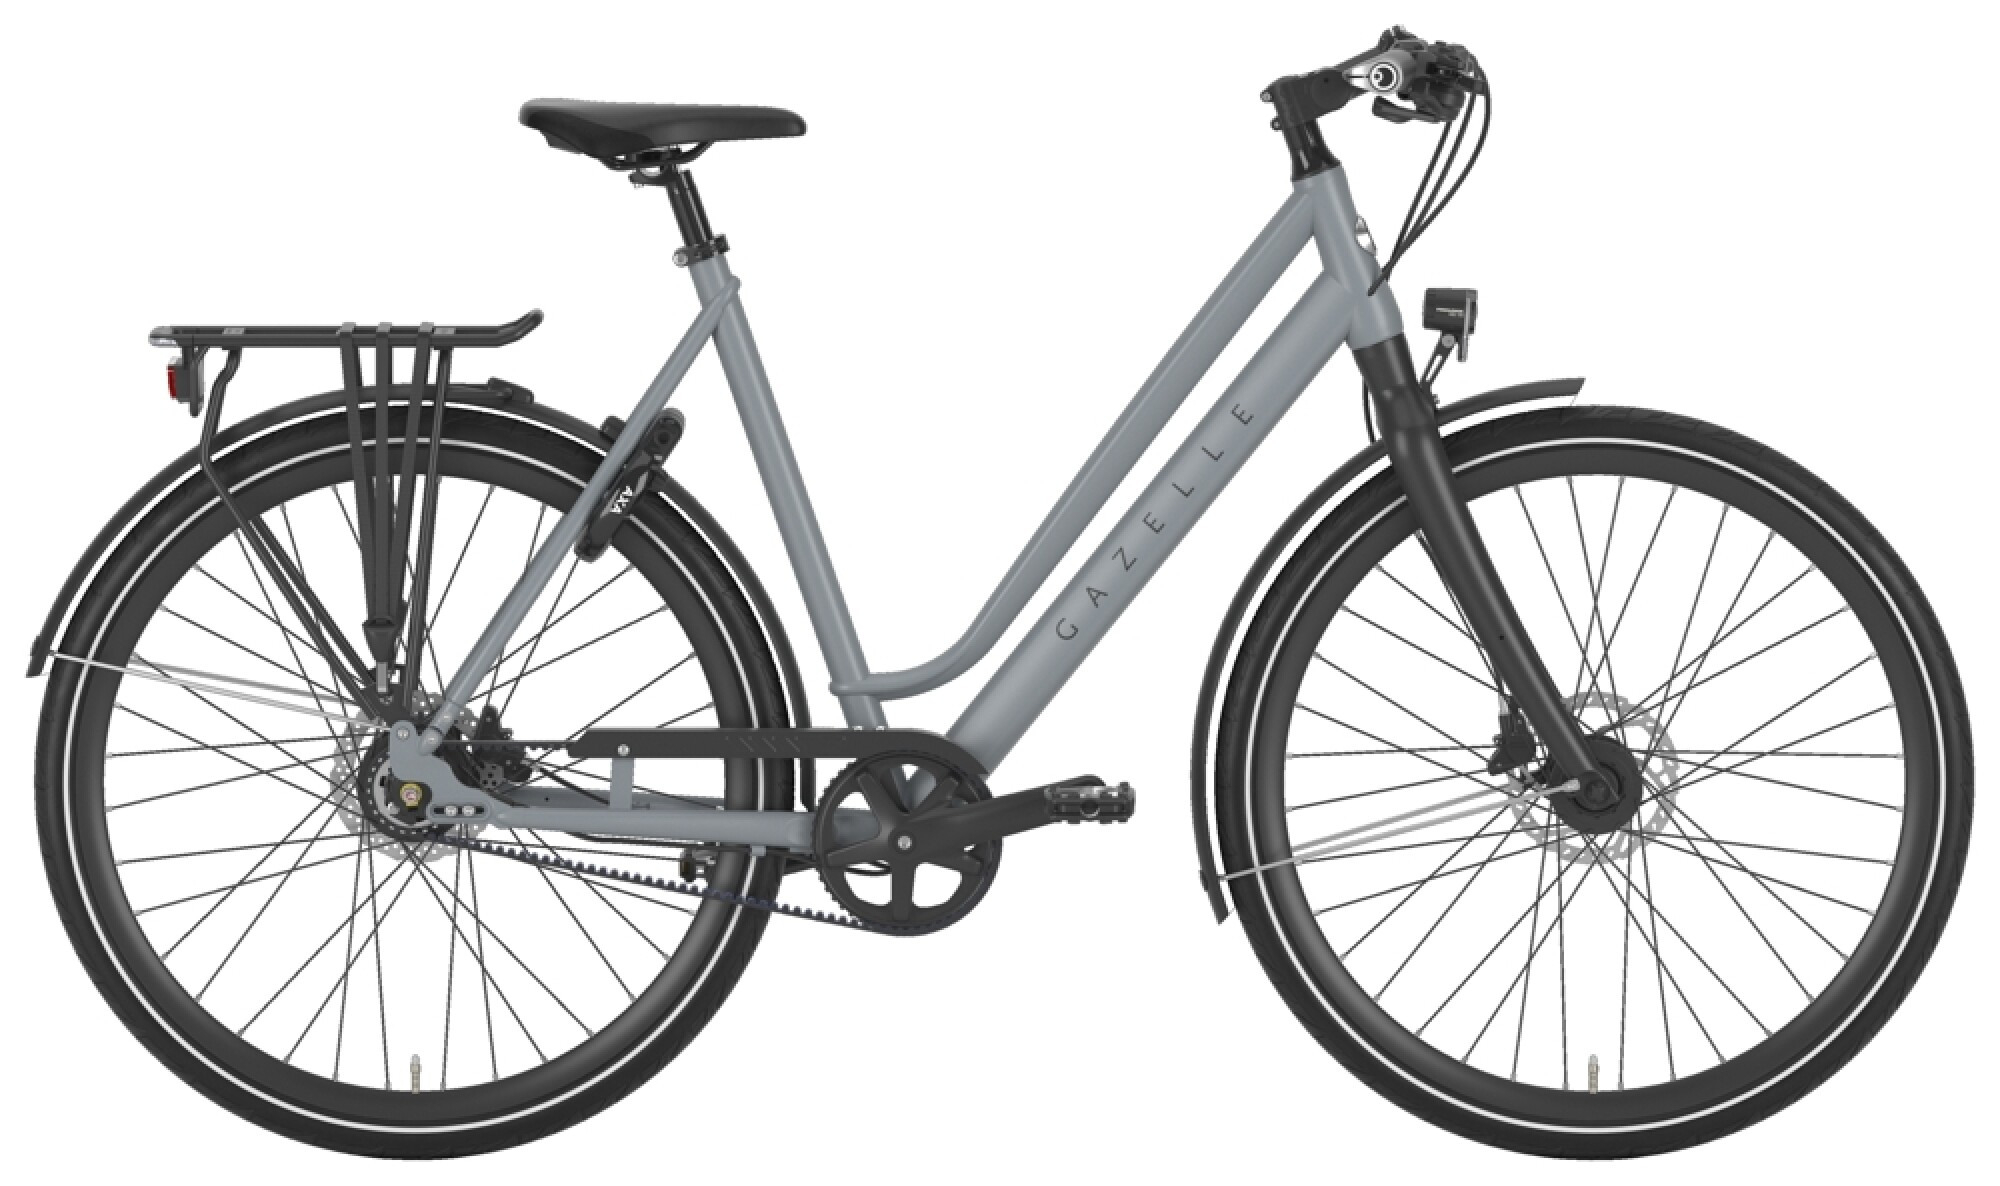 Citybike Gazelle Marco Polo Urban T8 2020 Bei Onbikexde